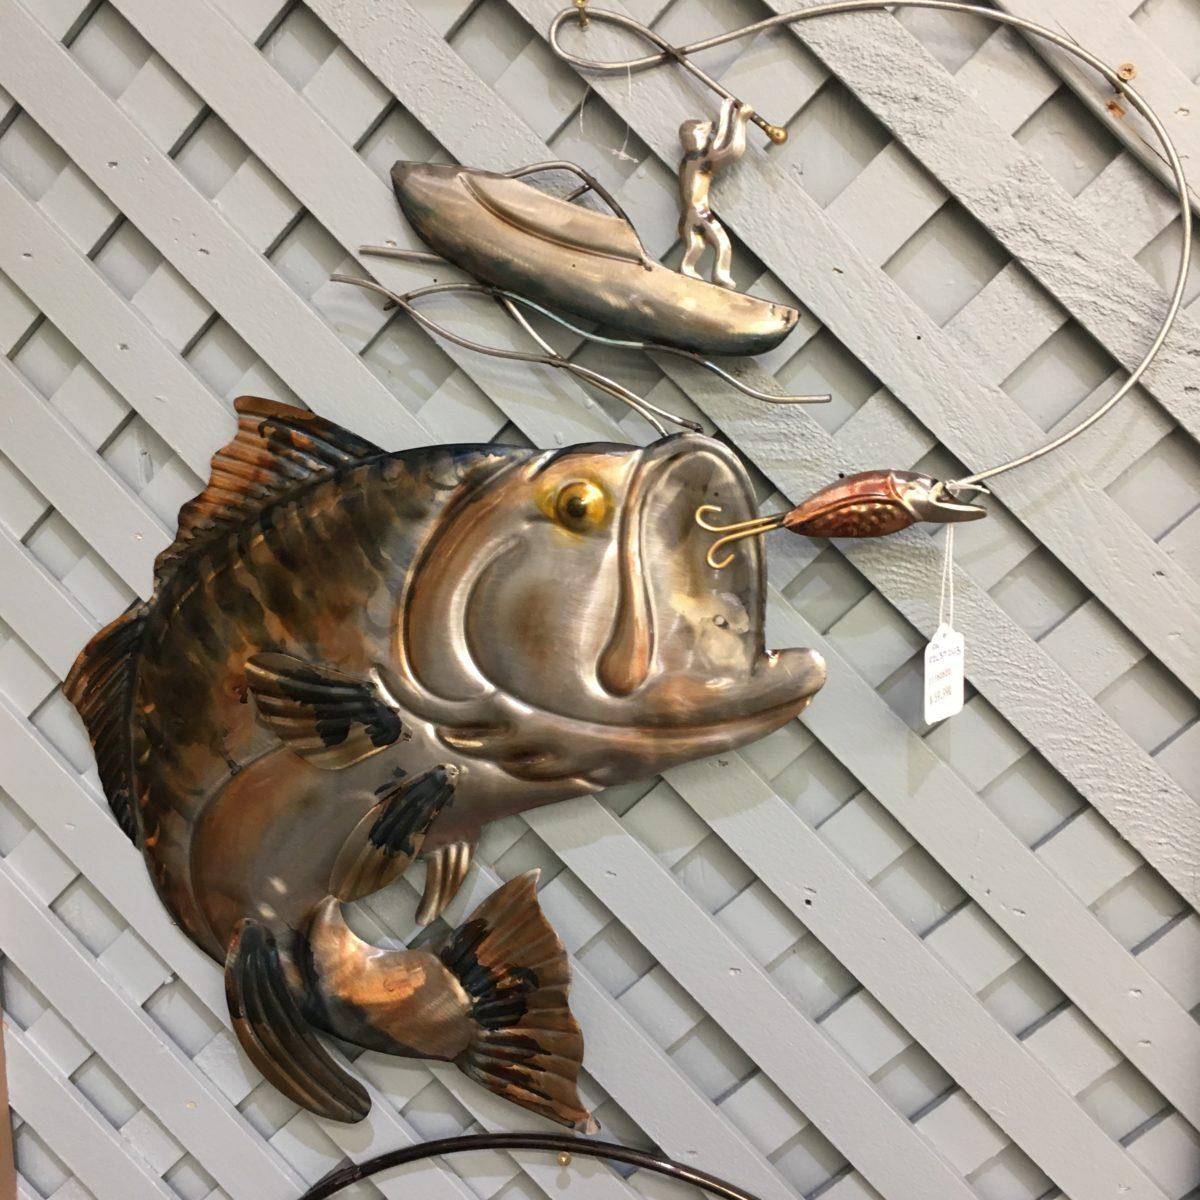 Fly-Fishing Wall Art - Home & Garden Decor - Cochrane ...